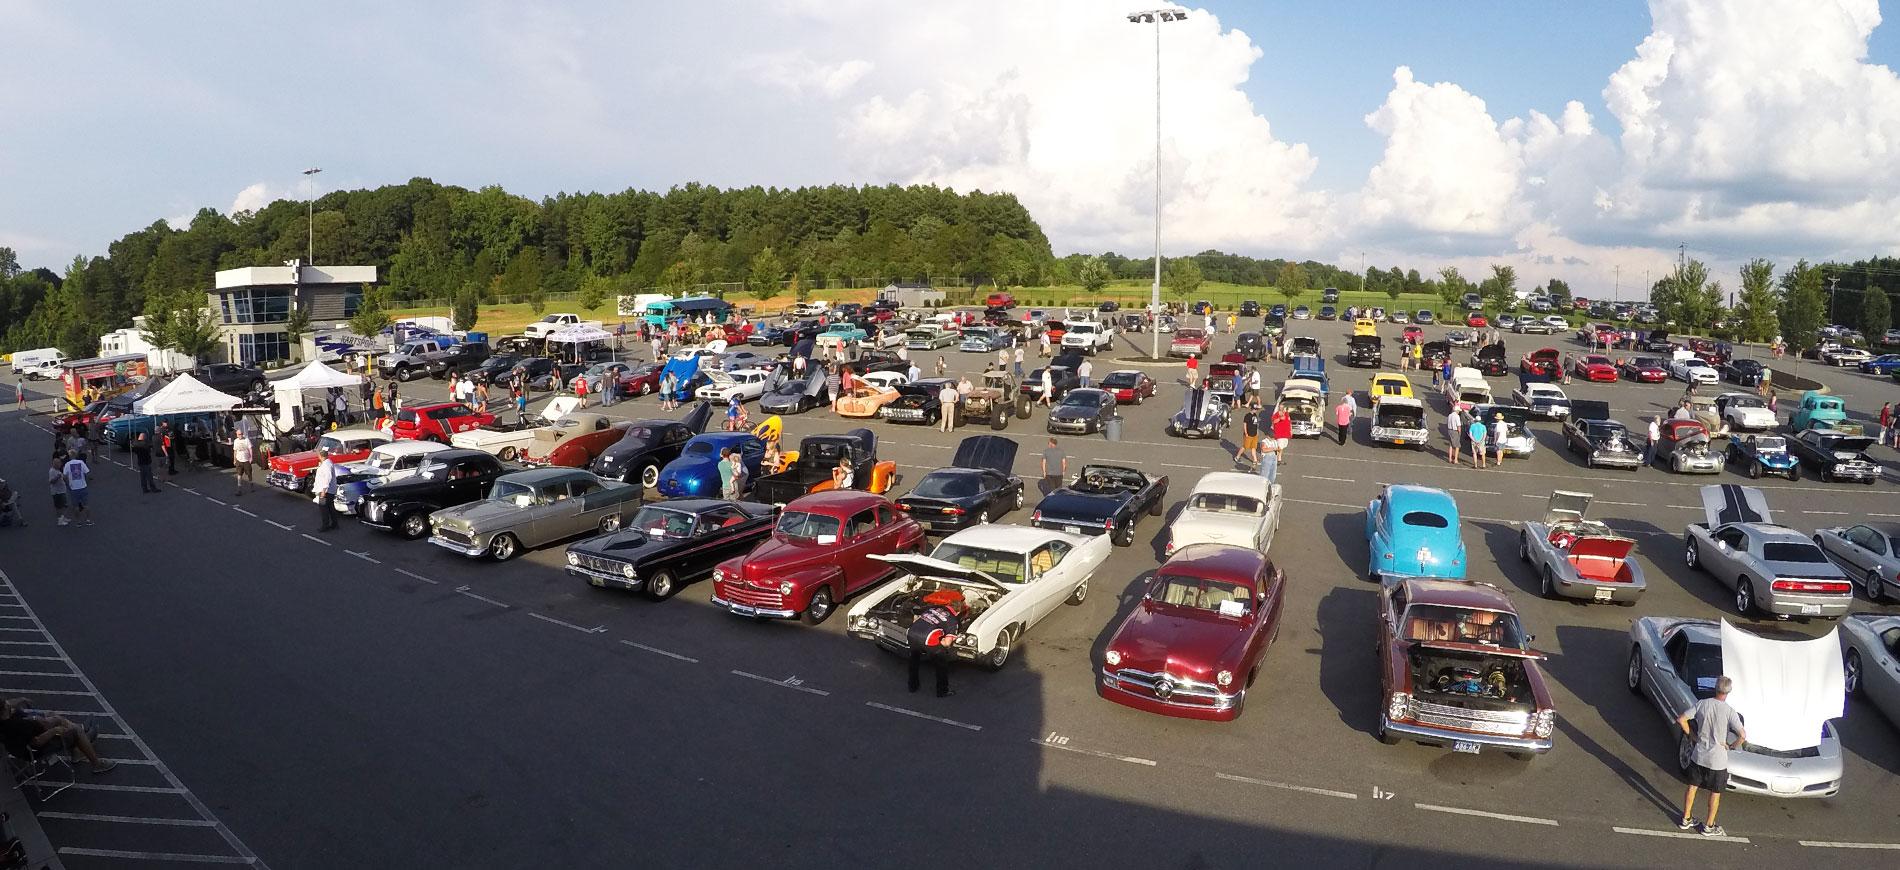 Car Show at GoPro Motorplex in Mooresville NC